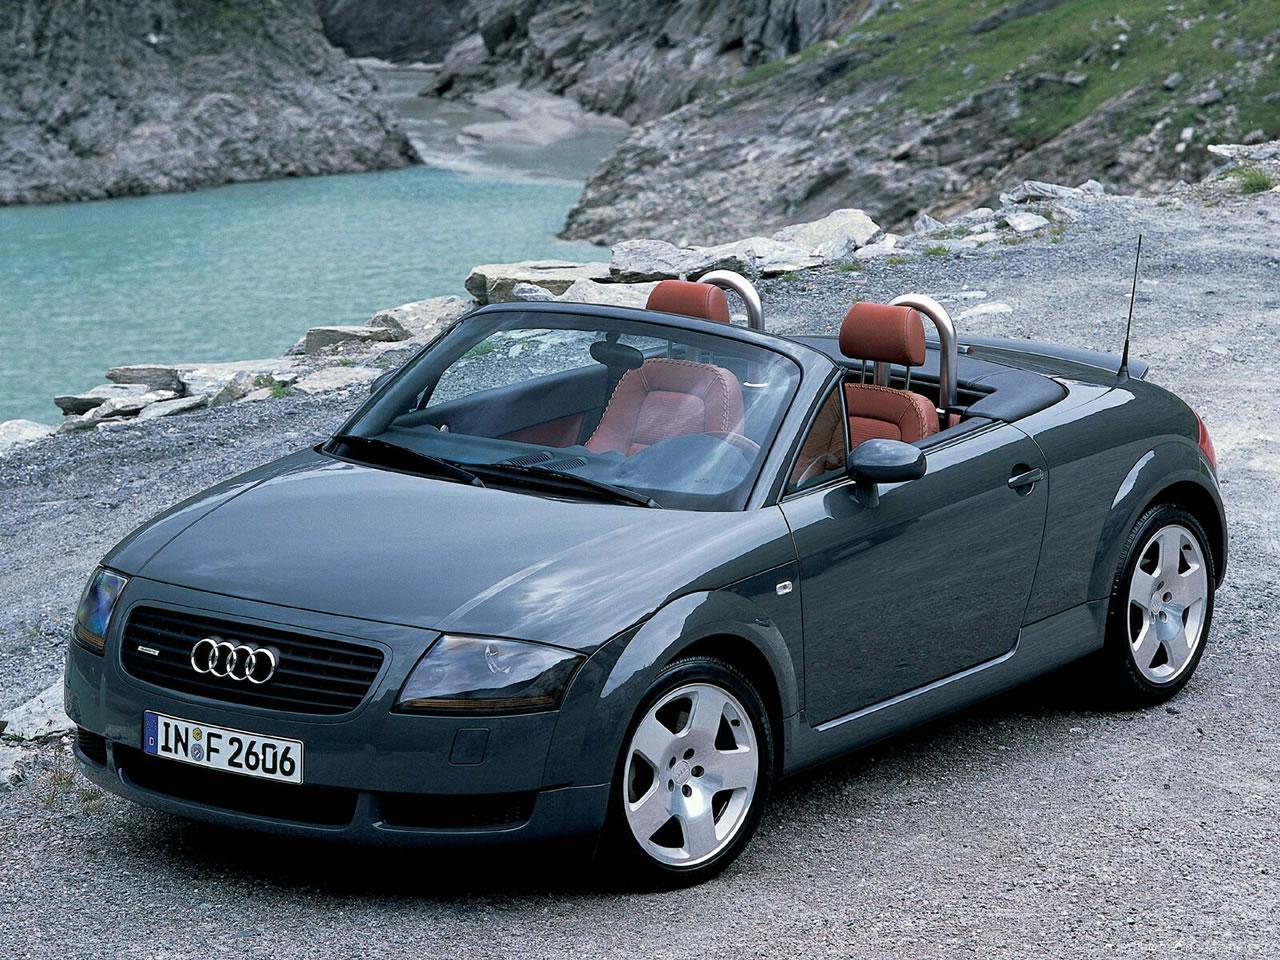 Audi TT Roadster Mk1 · Audi TT Roadster Mk1 ...